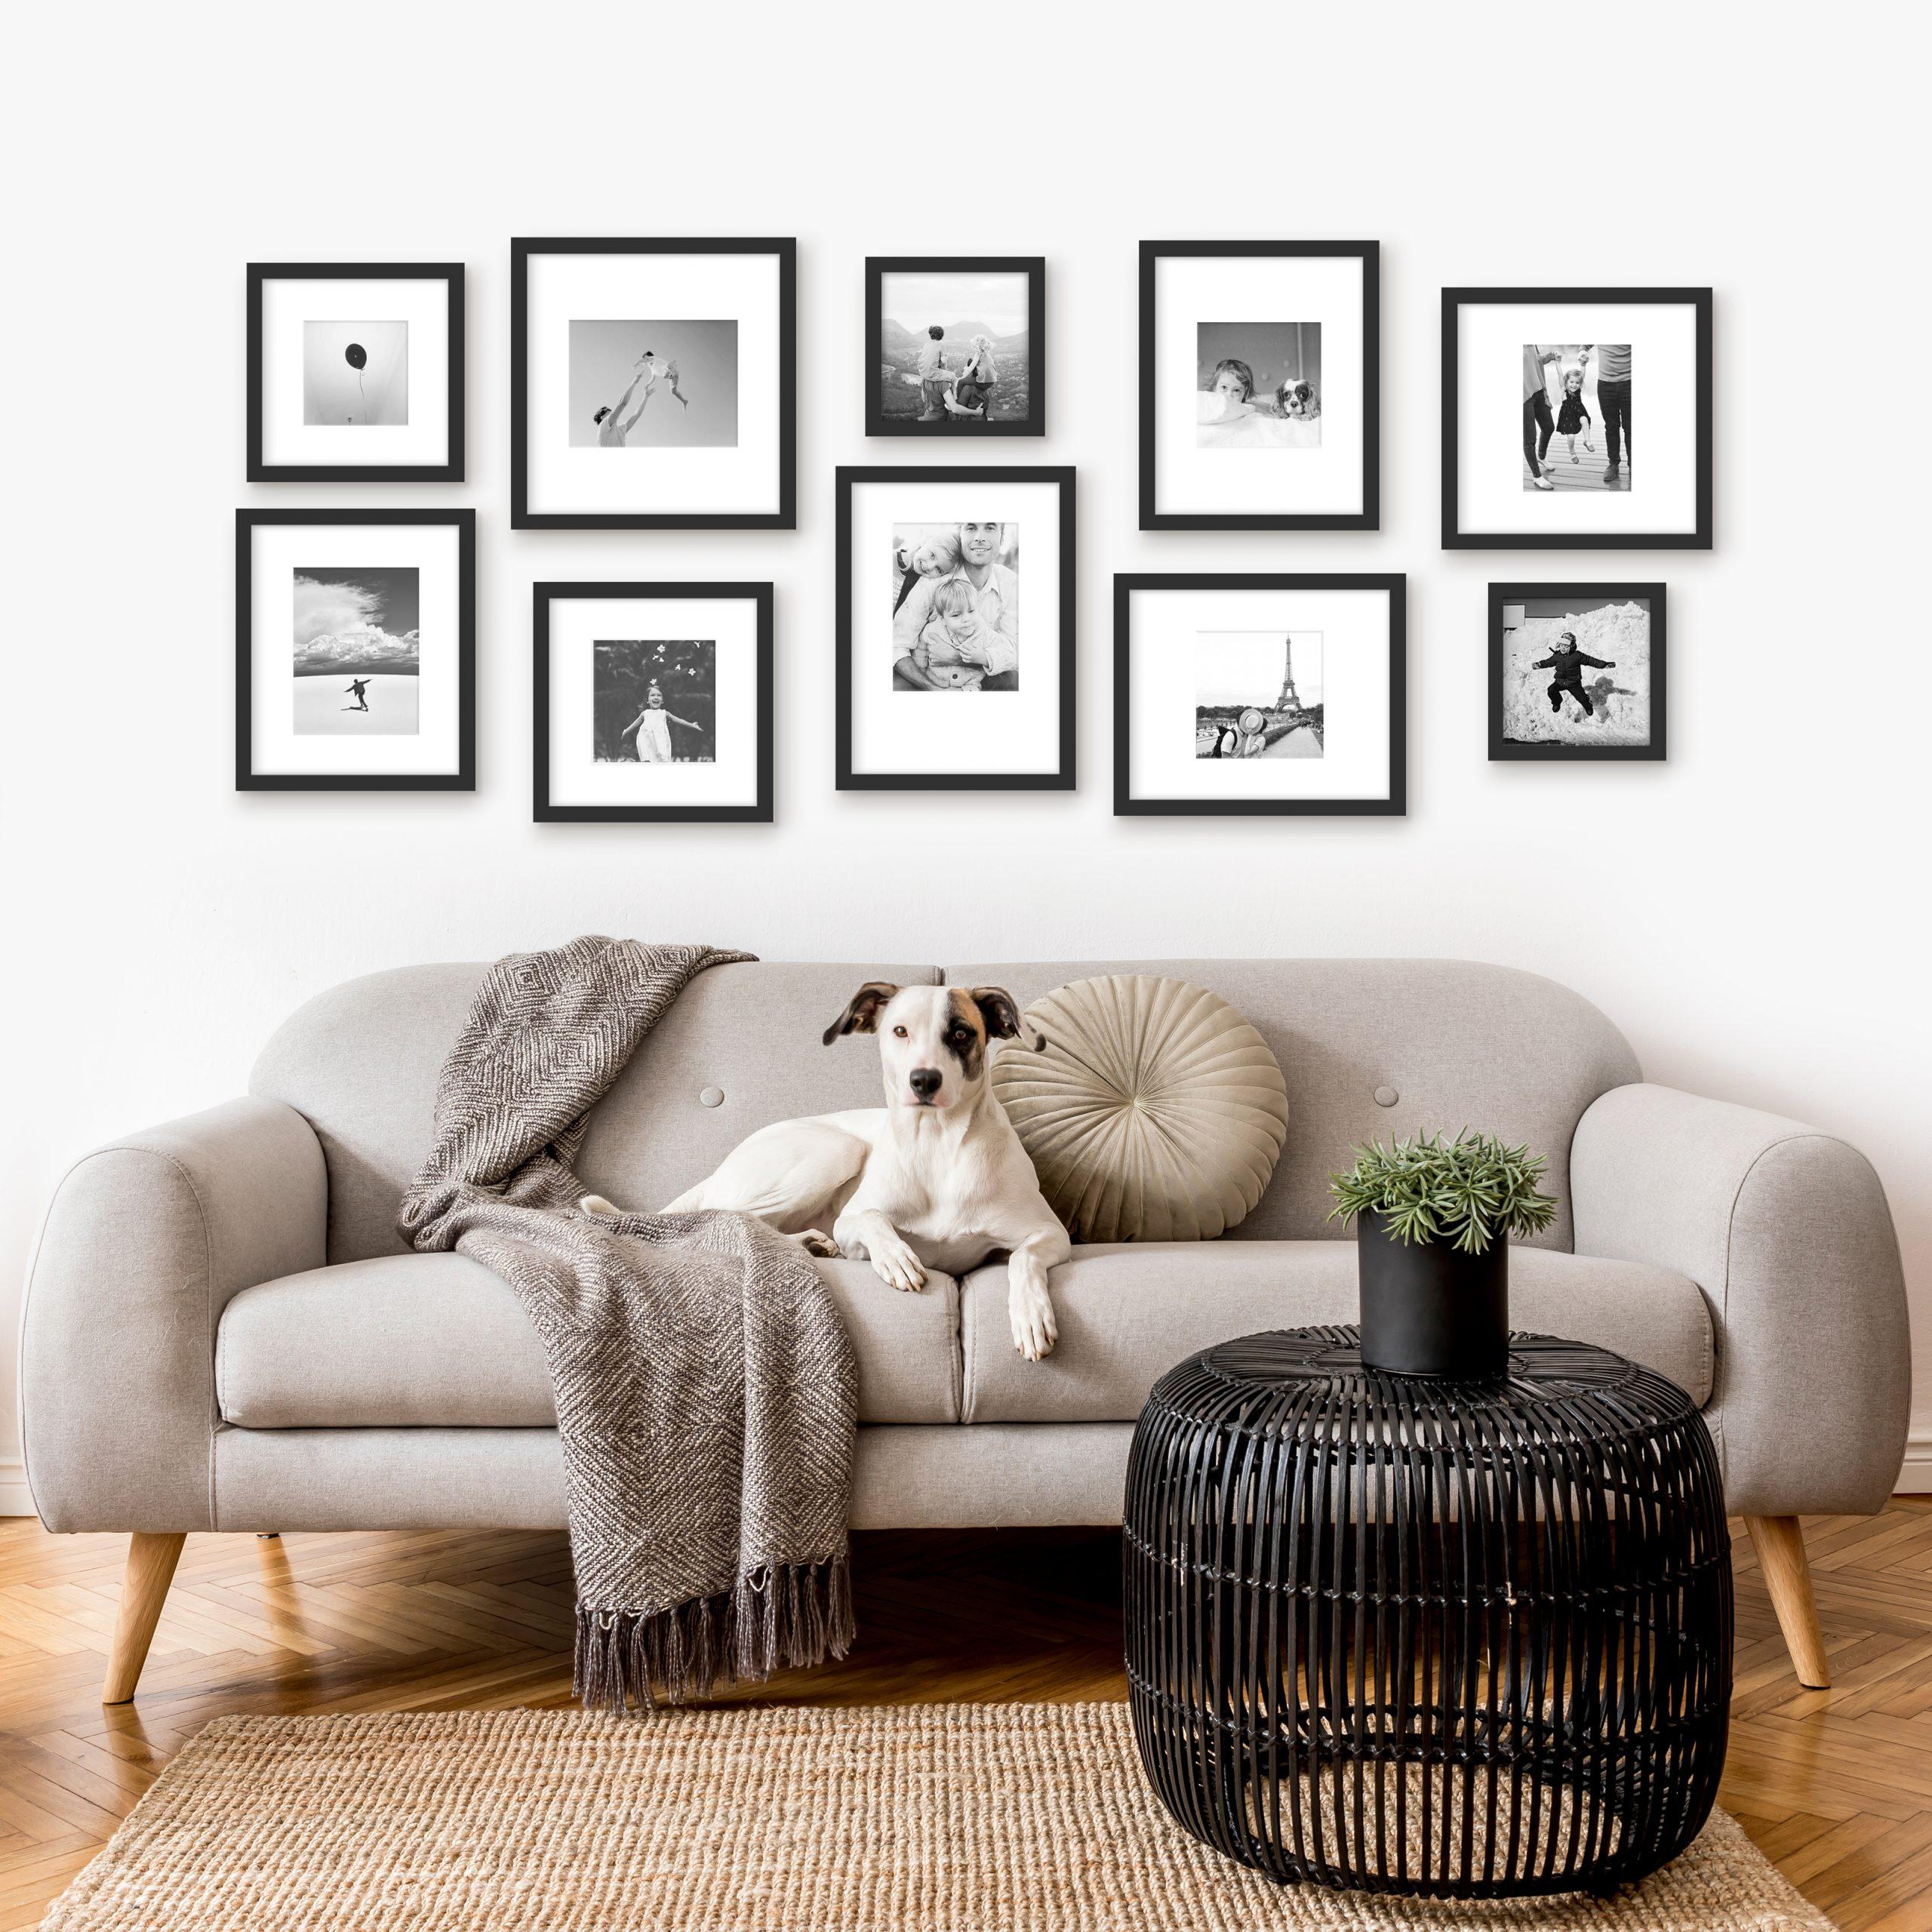 New Gallery Wall Products Framefox framed wall art framing decor styling